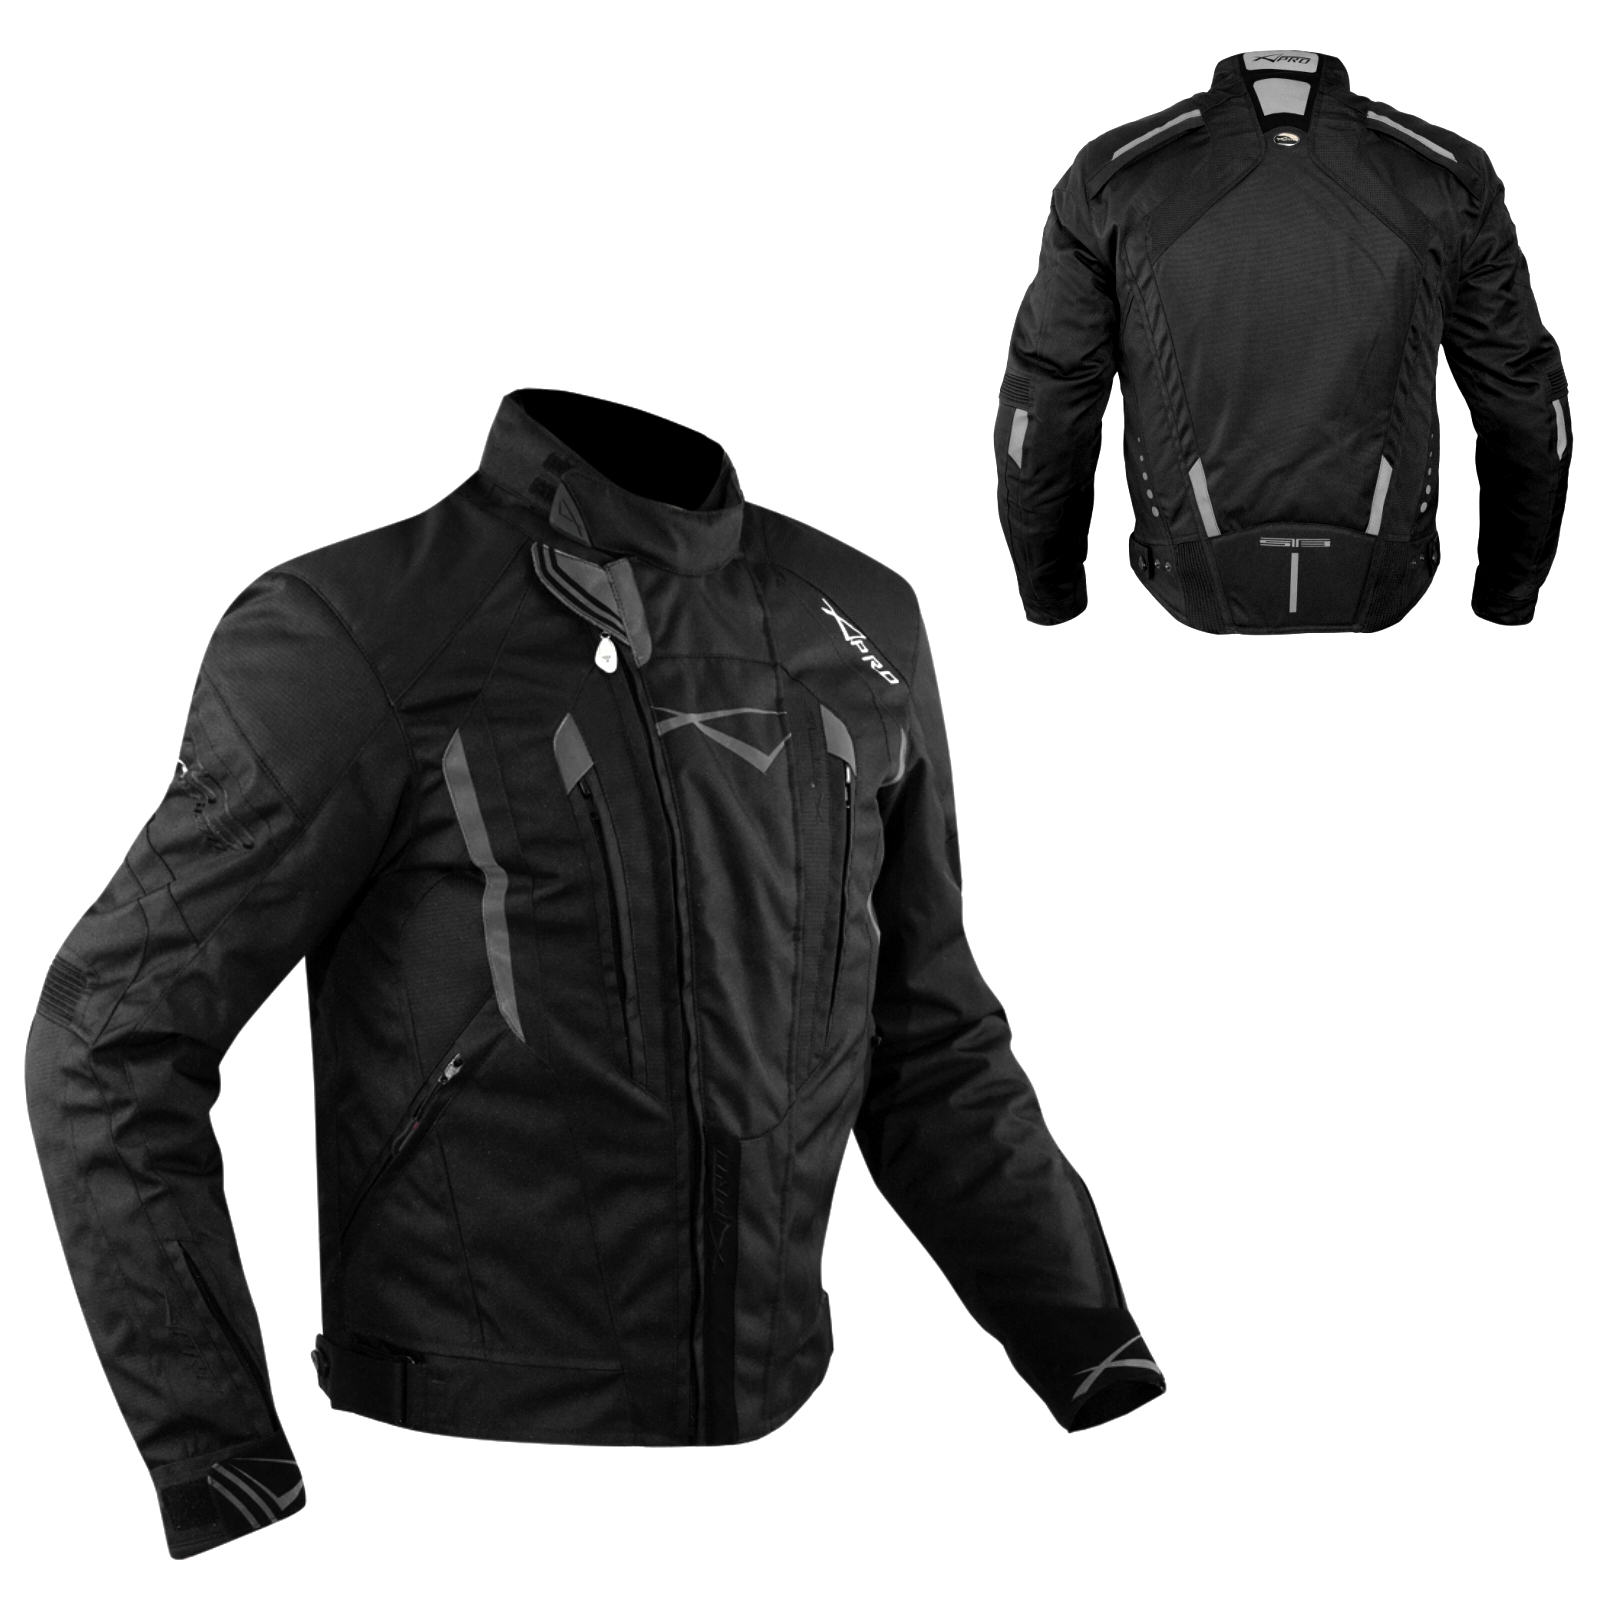 miniatuur 6 - Giacca-Cordura-Moto-Tessuto-Impermeabile-Sport-Termica-Sfoderabile-Nero